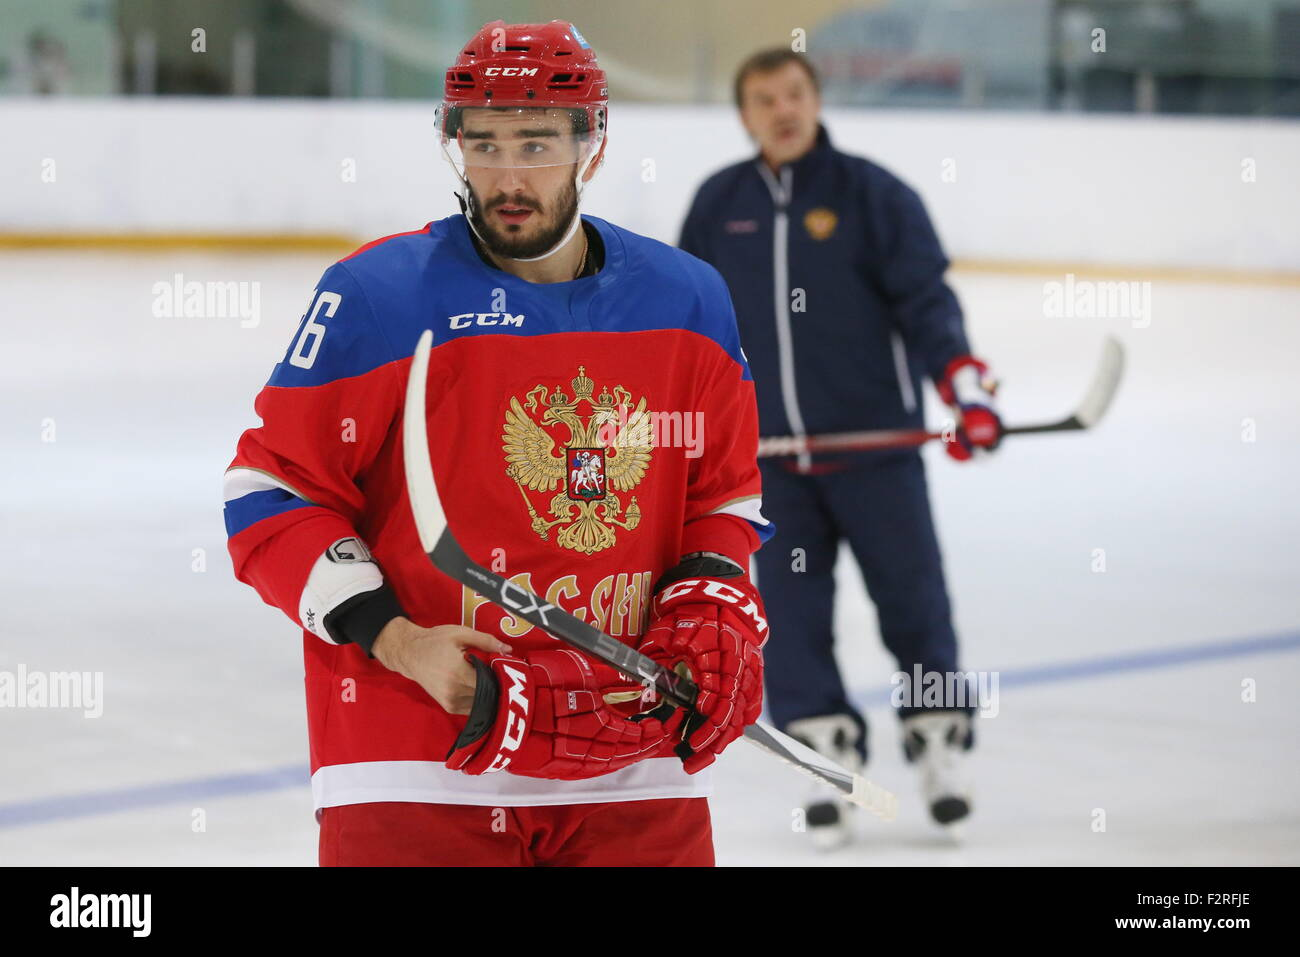 Russian hockey player